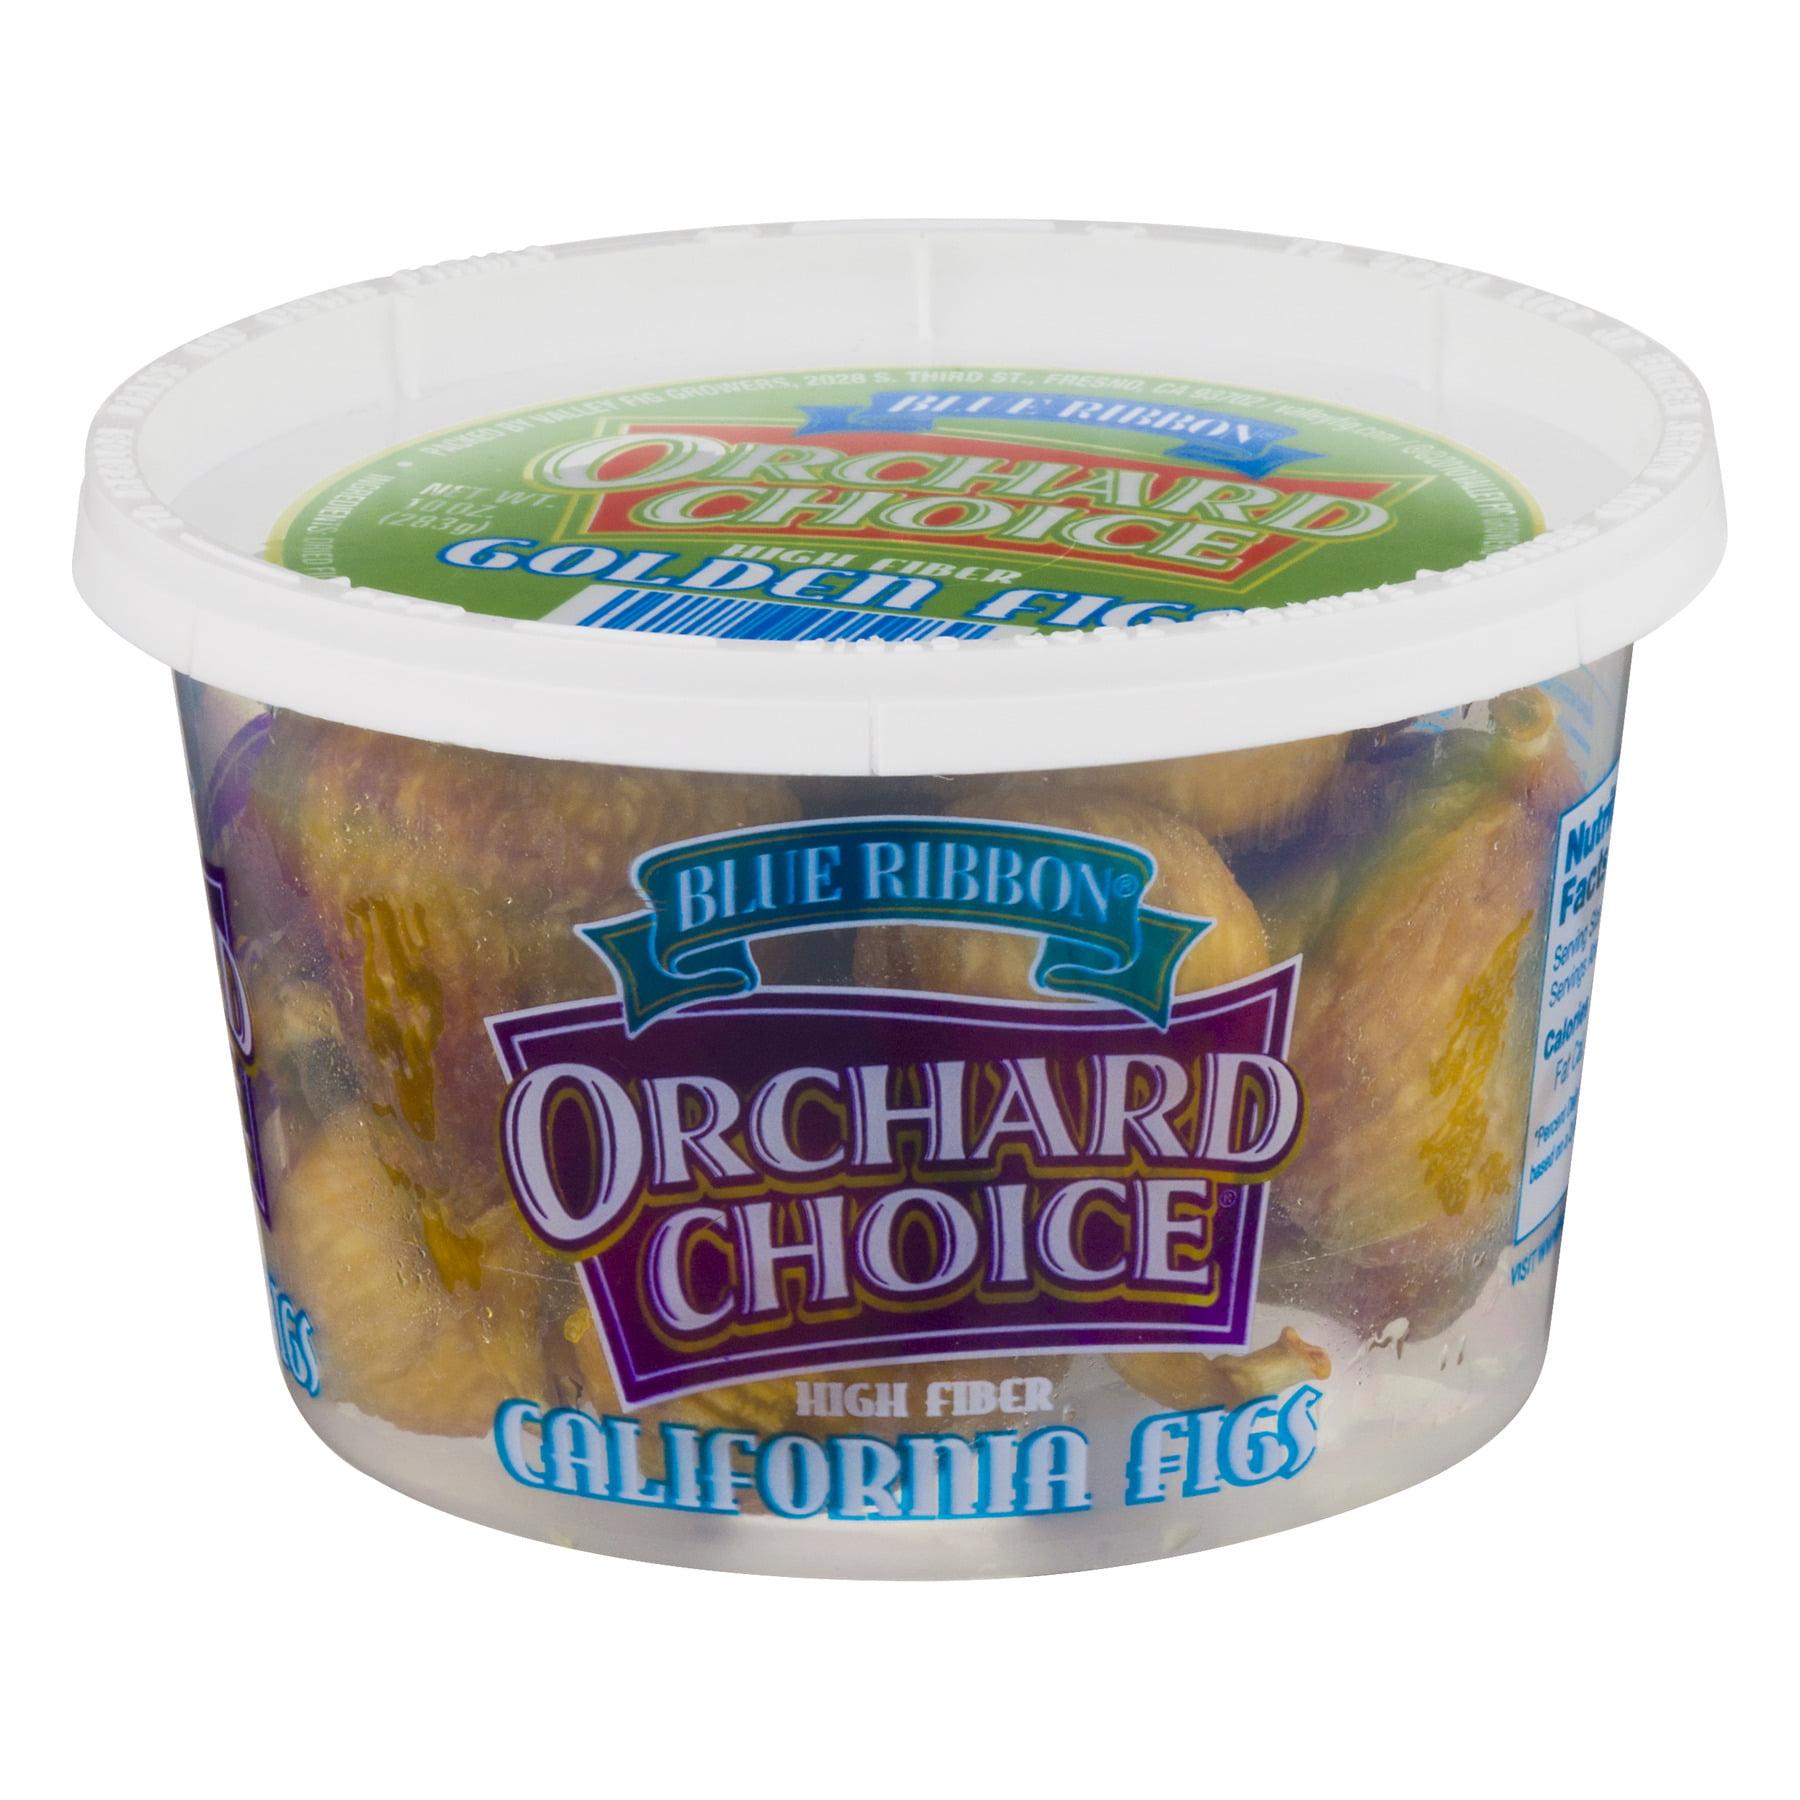 Blue Ribbon Orchard Choice  Golden Figs 10 Oz Plastic Tub